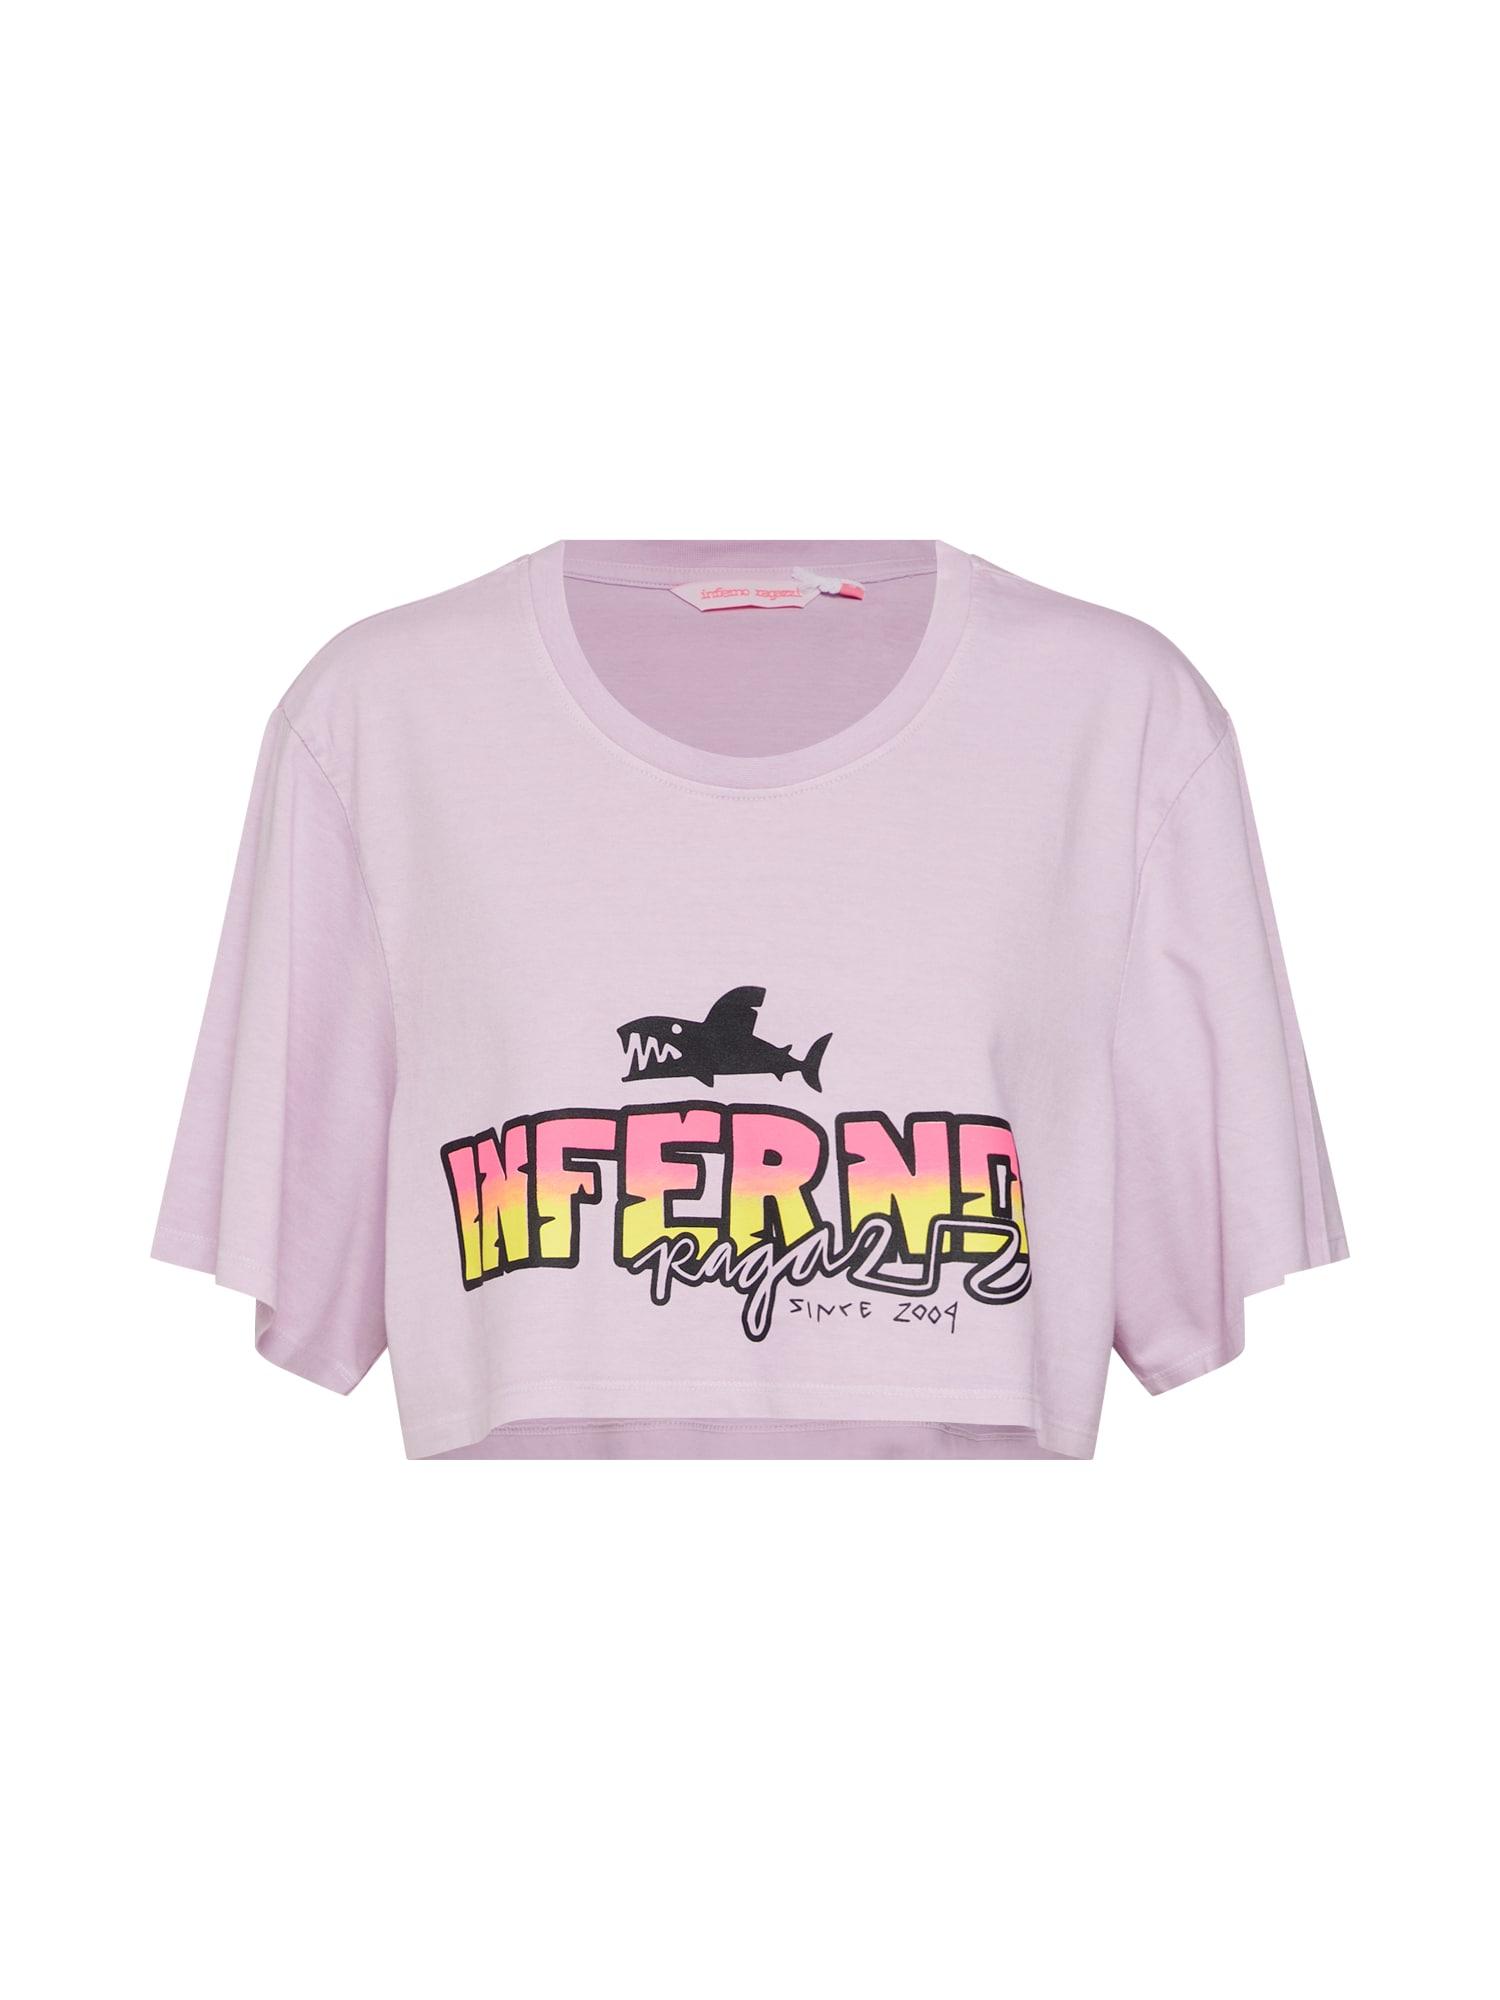 Tričko Hell Yeah lenvandulová mix barev pink Inferno Ragazzi